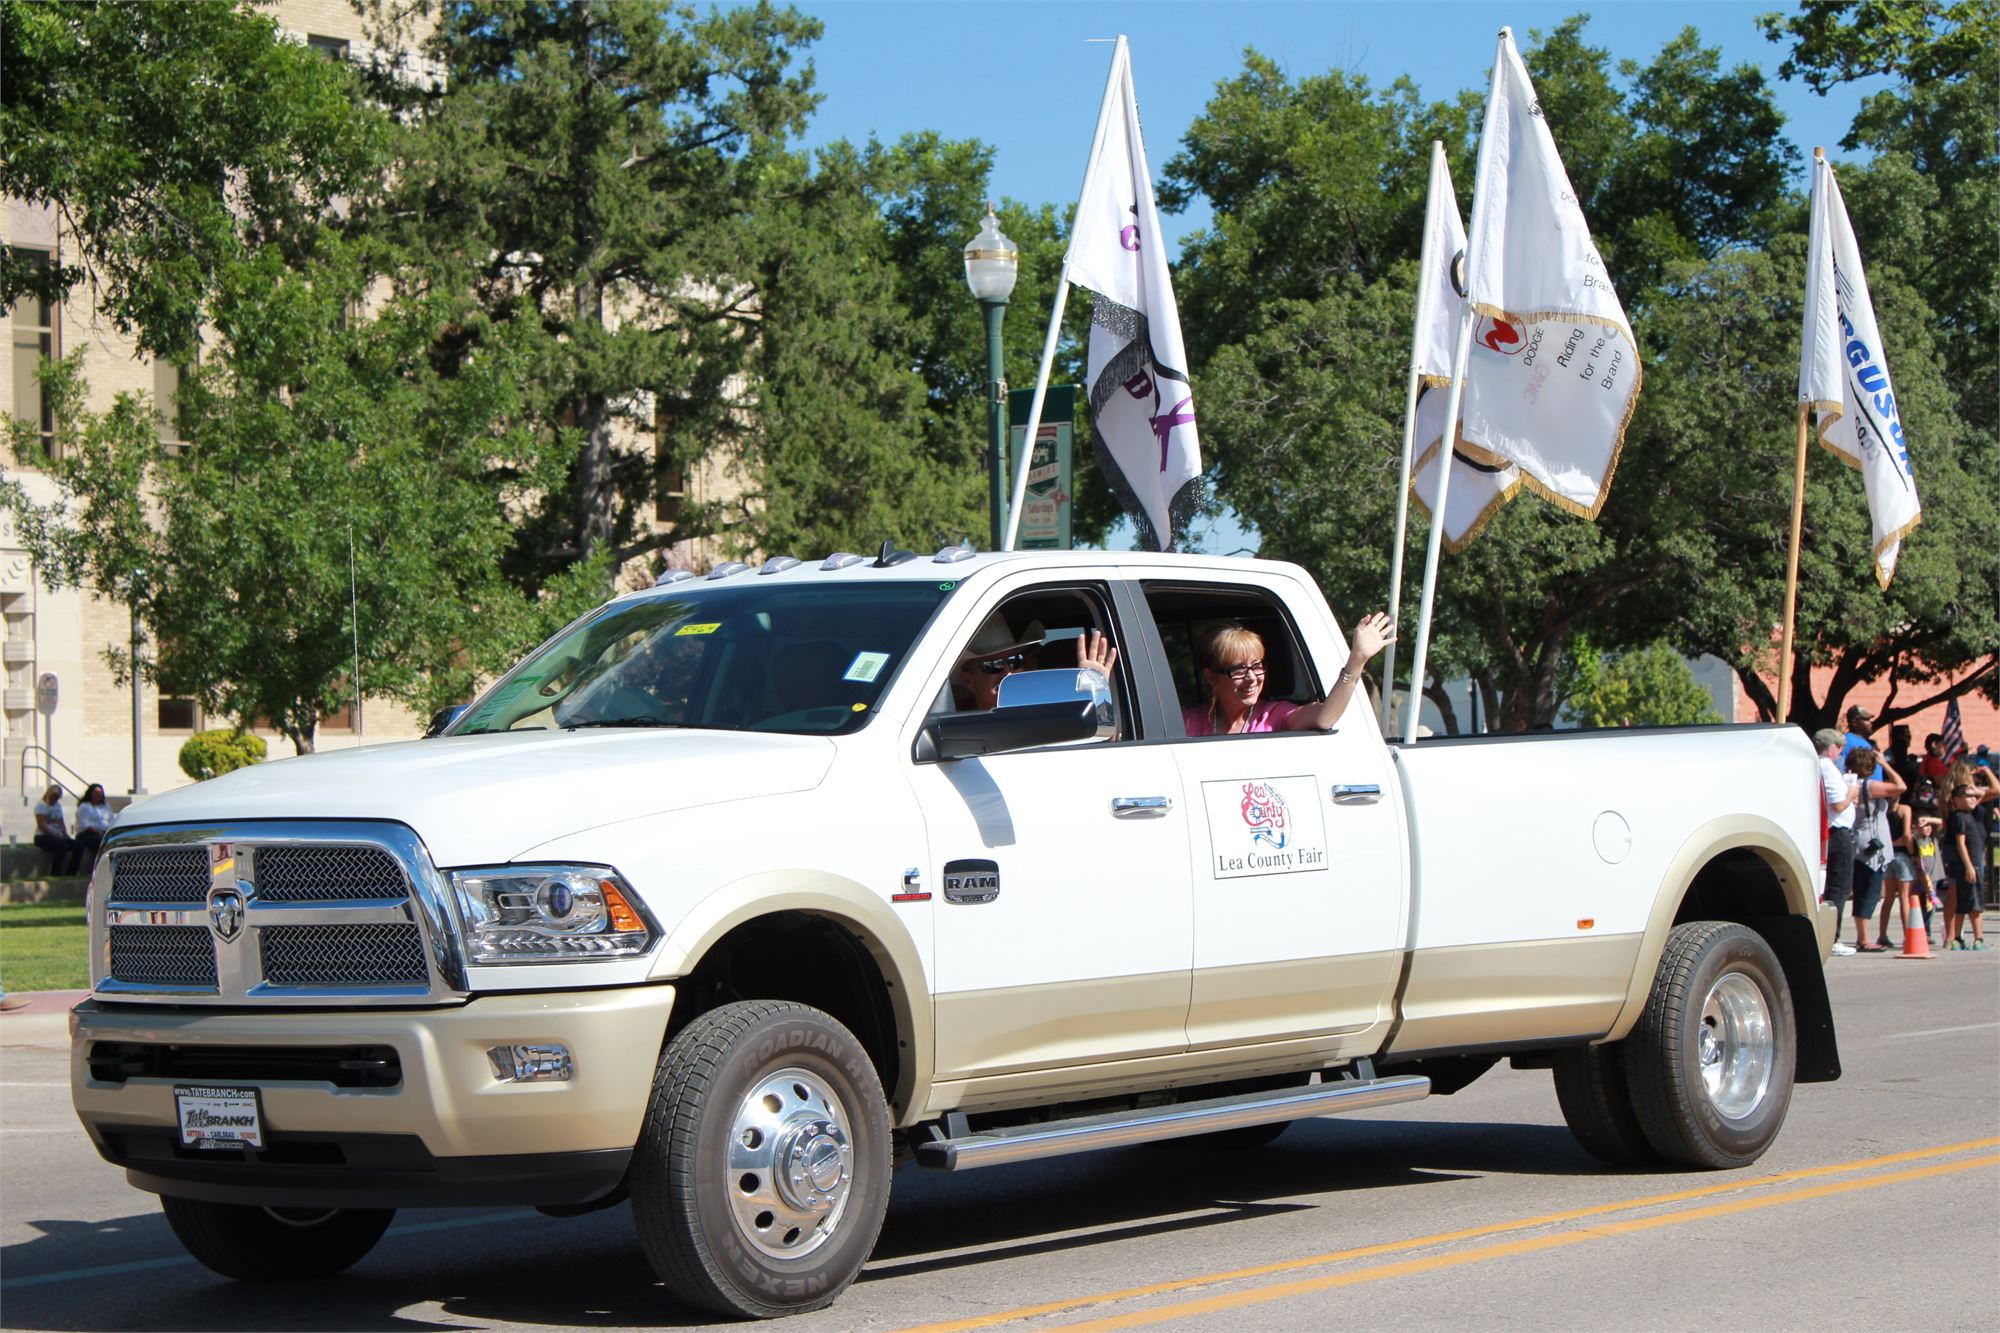 Fair & Rodeo Parade